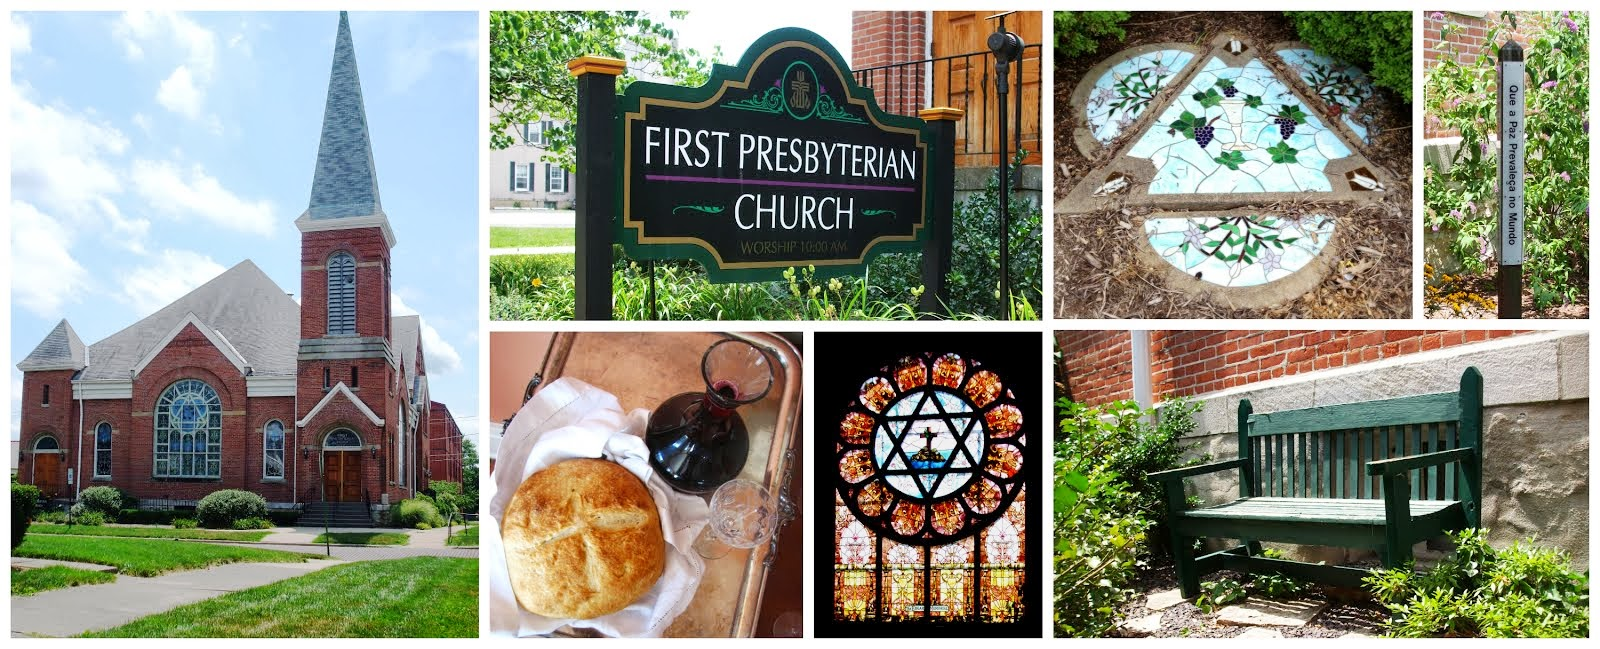 First Presbyterian Church of Lincoln, Illinois